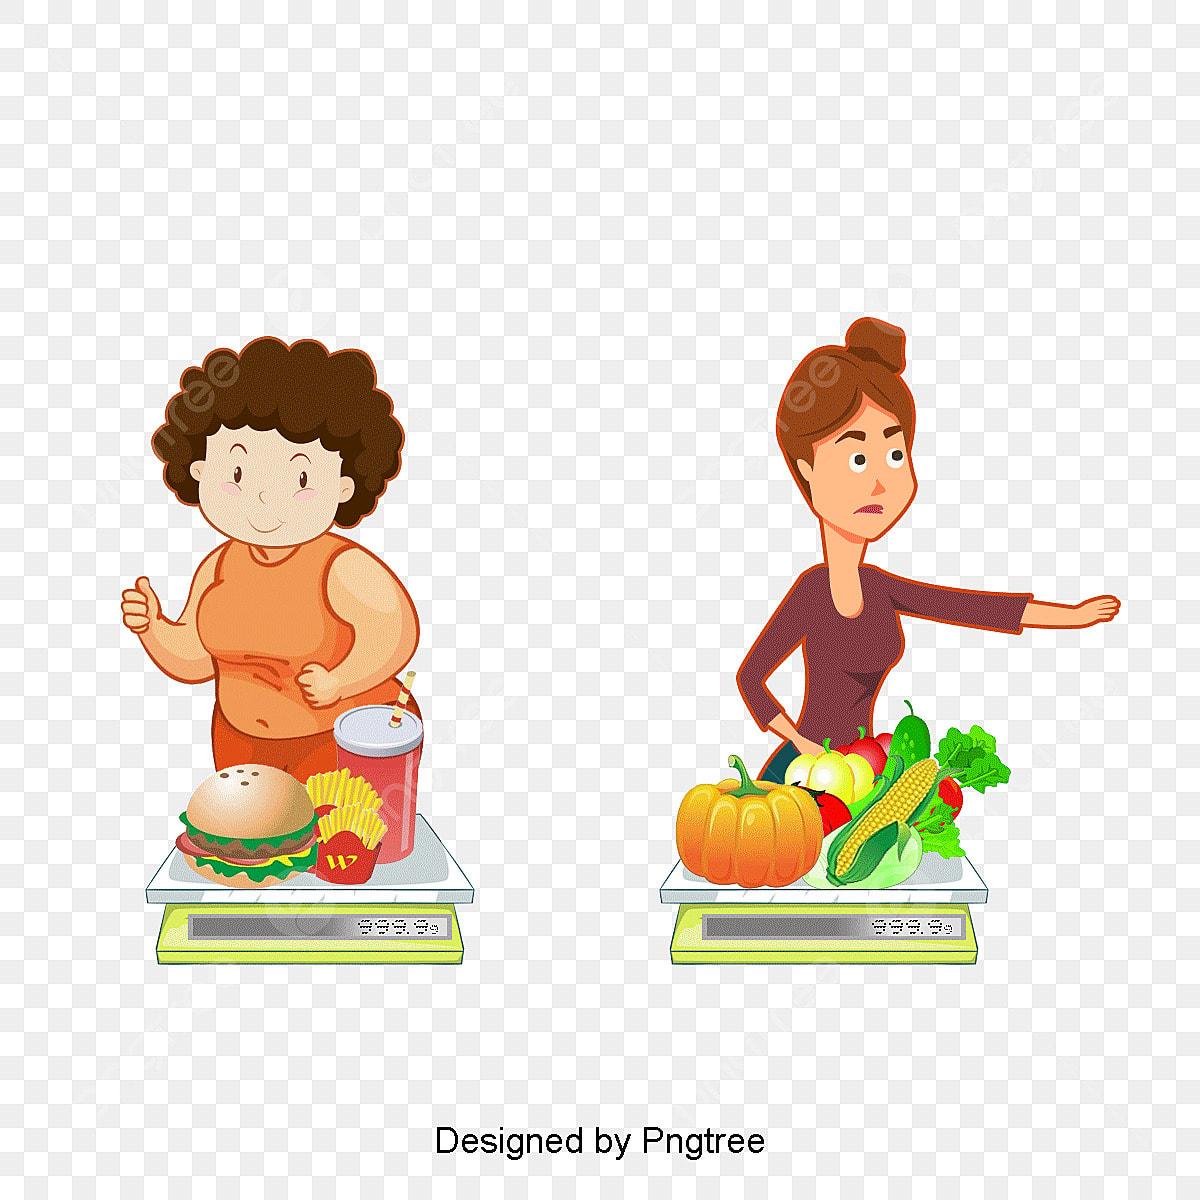 Junk Food And Healthy Food Compare, Cartoon, Ae, Vector